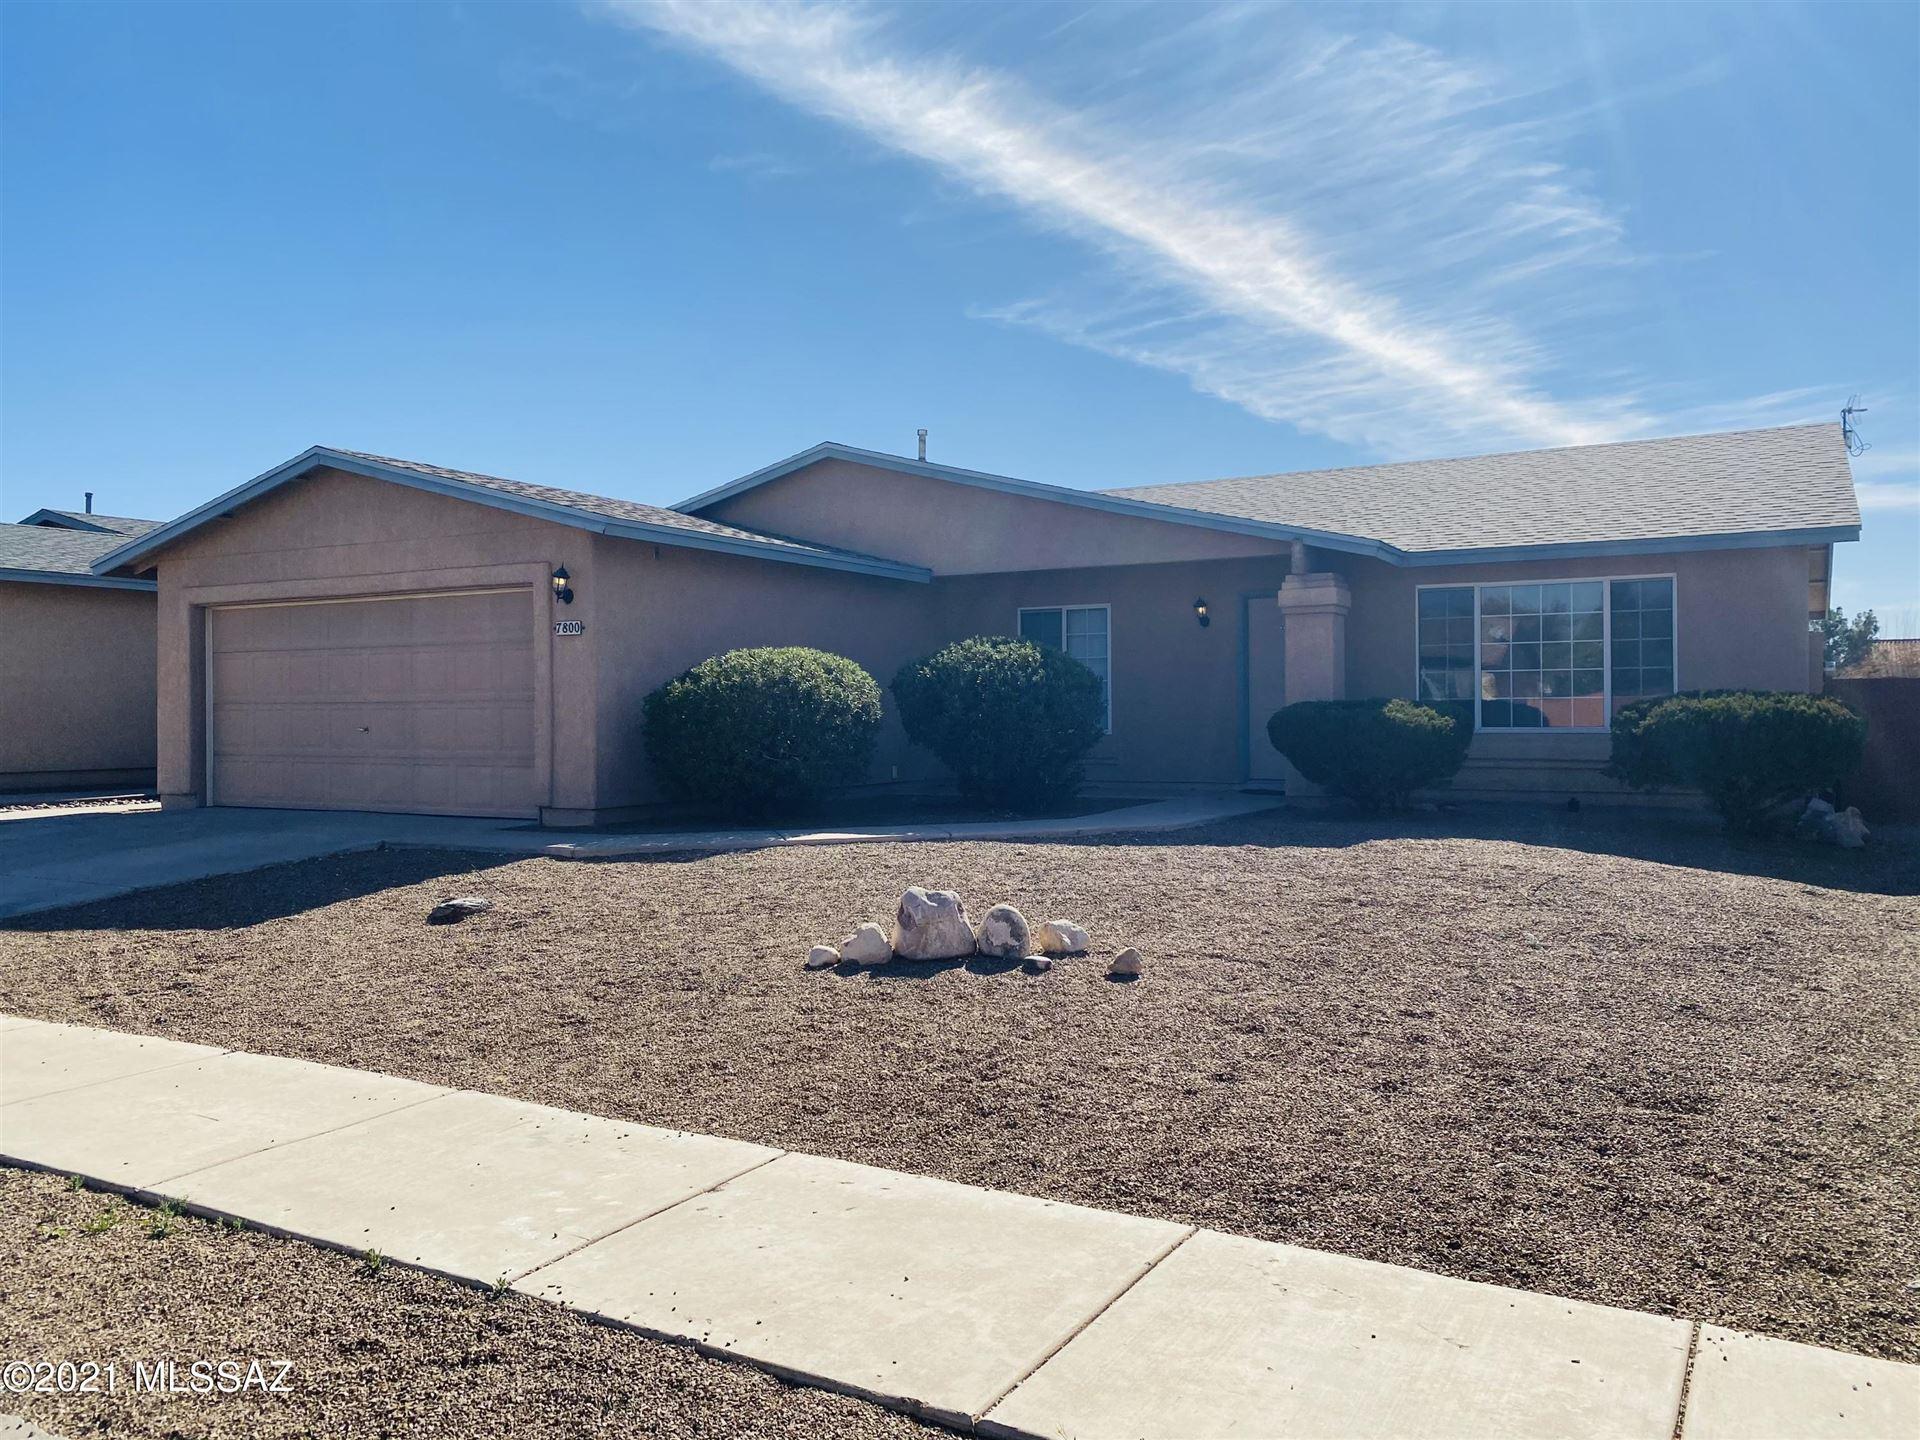 7800 S Danforth Avenue, Tucson, AZ 85747 - MLS#: 22105211